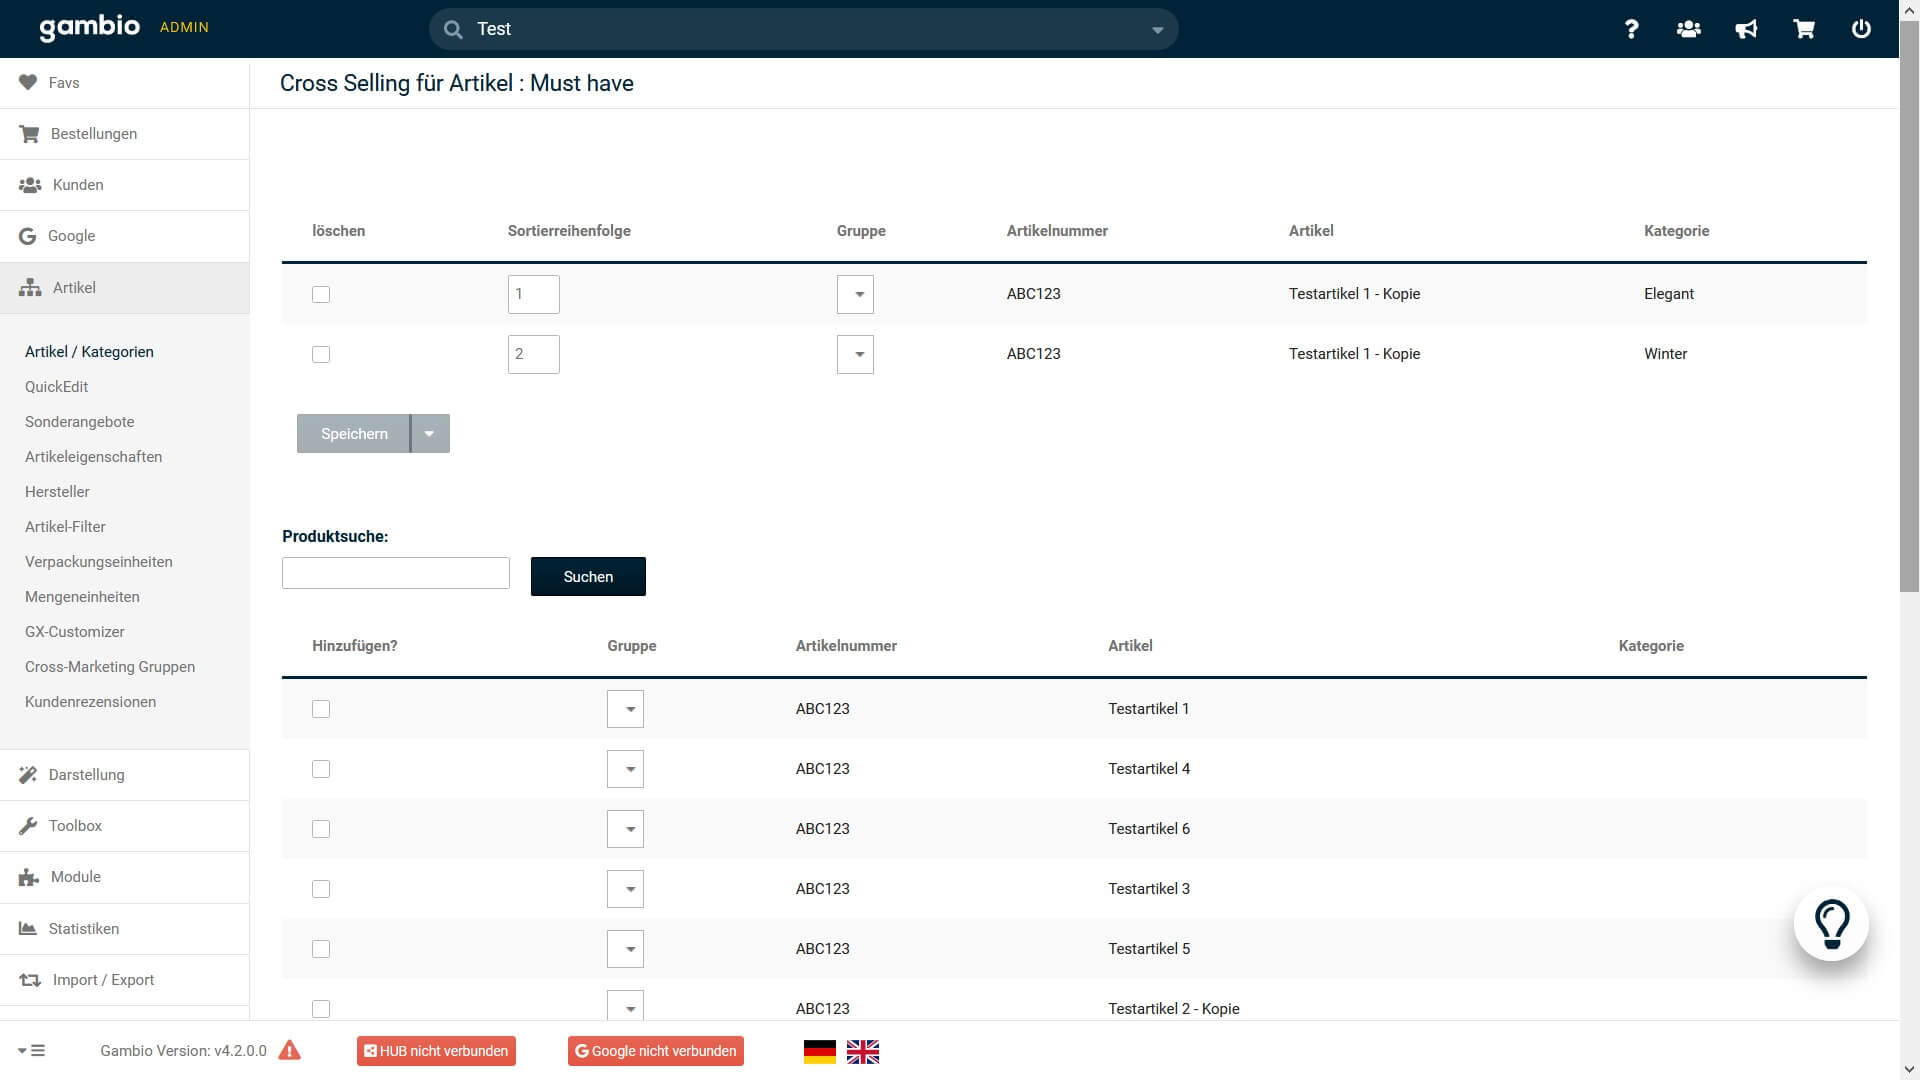 Cross Selling Zuordnung im Gambio Admin